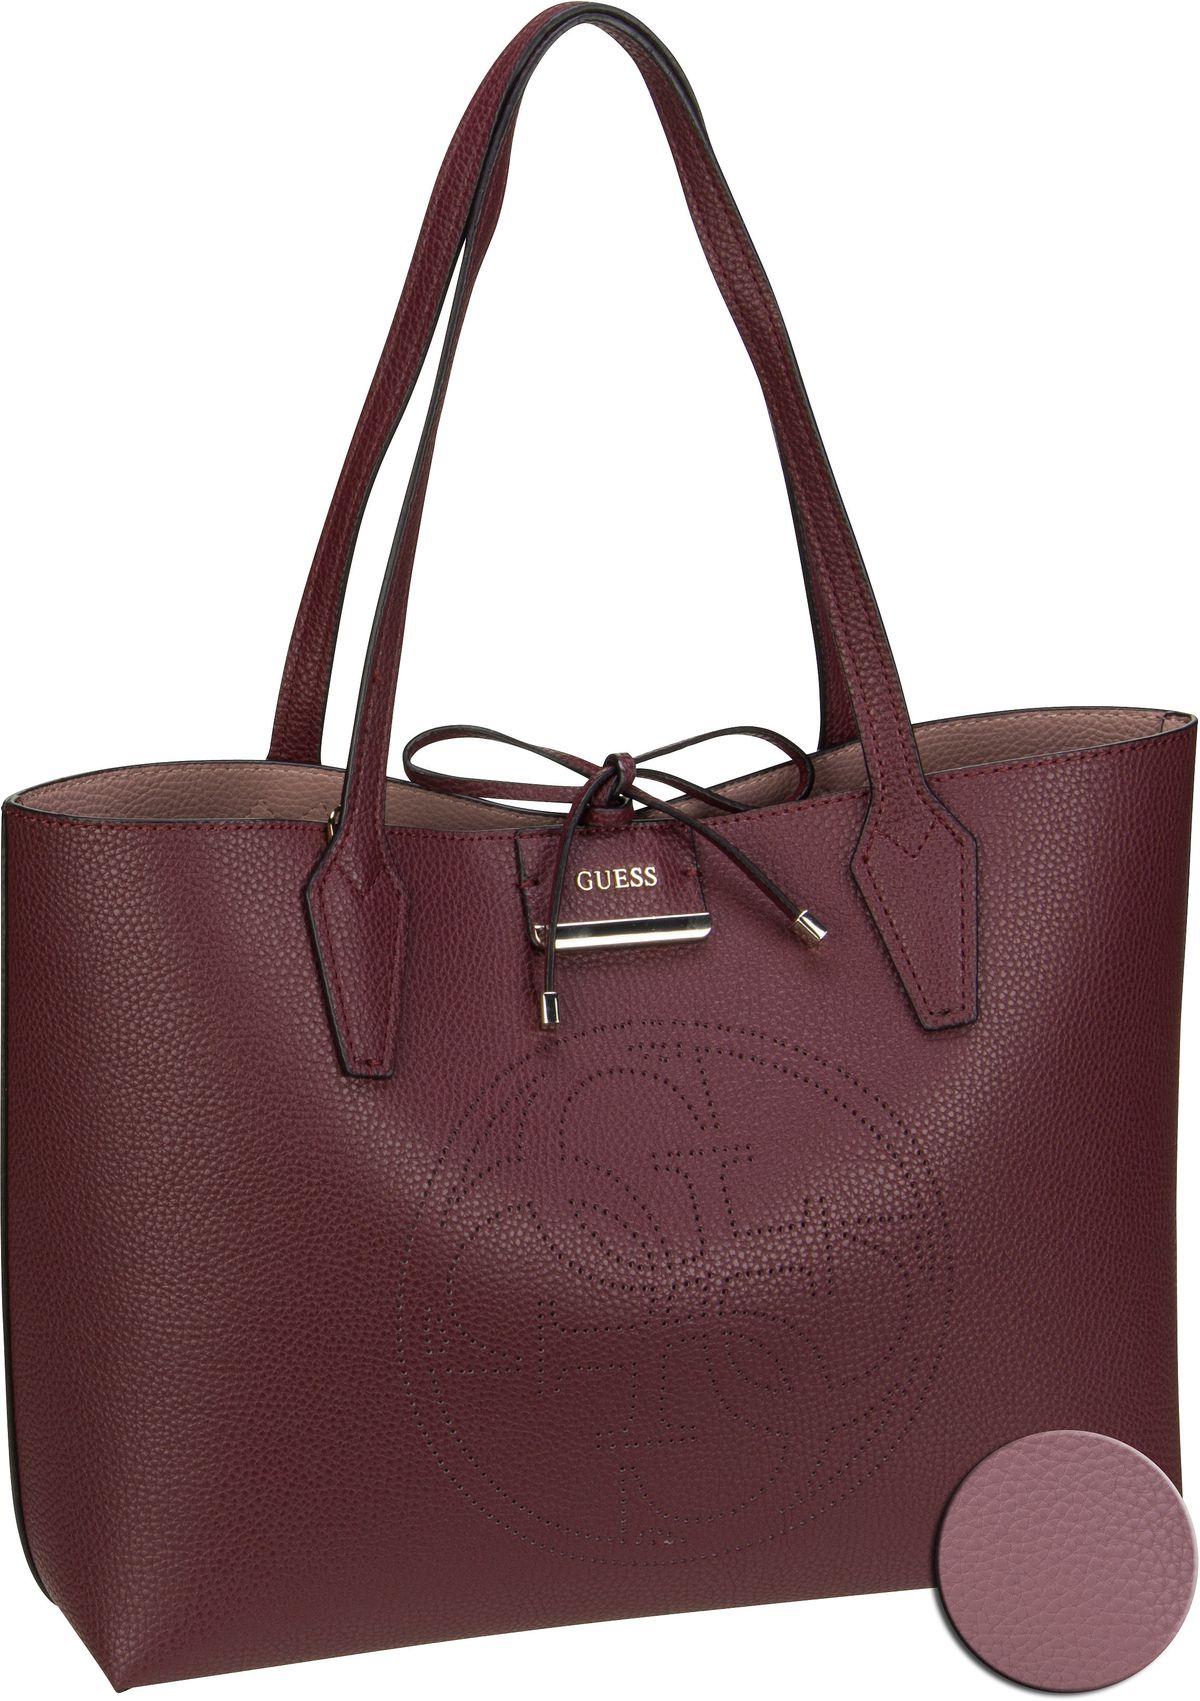 Handtasche Bobbi AA Inside Out Tote Merlot/Rosewood (innen: Rosé)